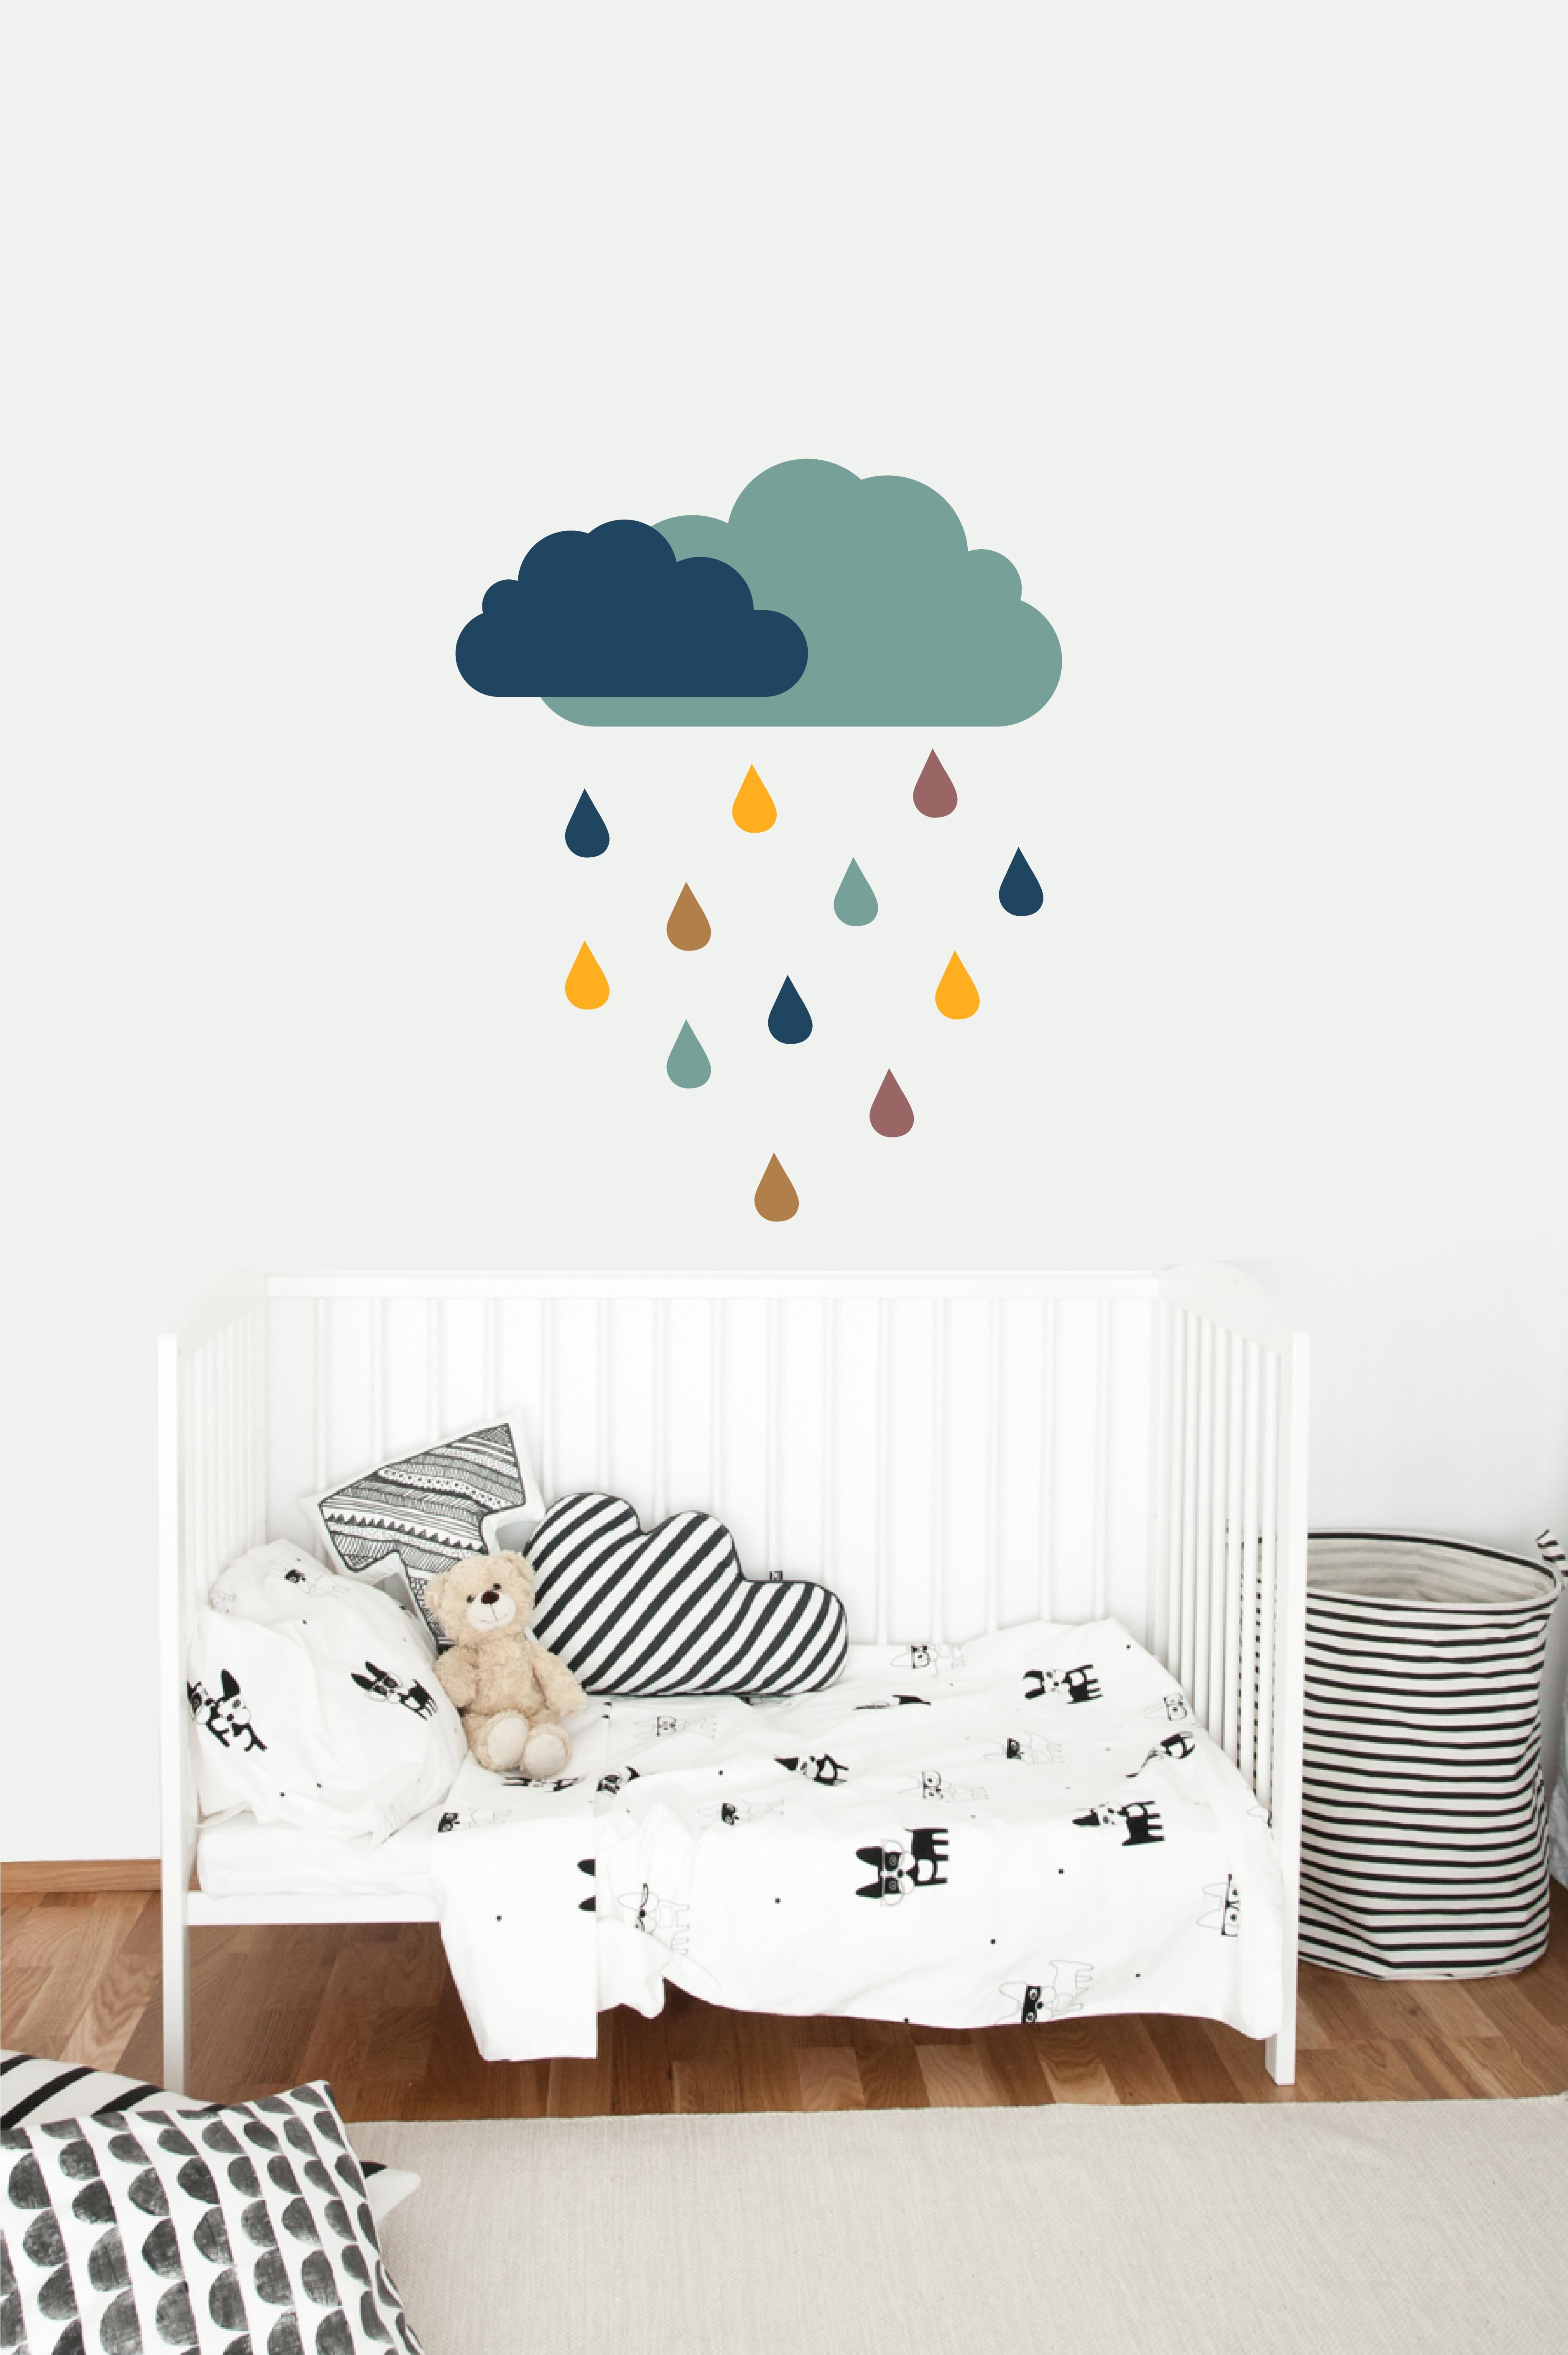 Muursticker rainy clouds